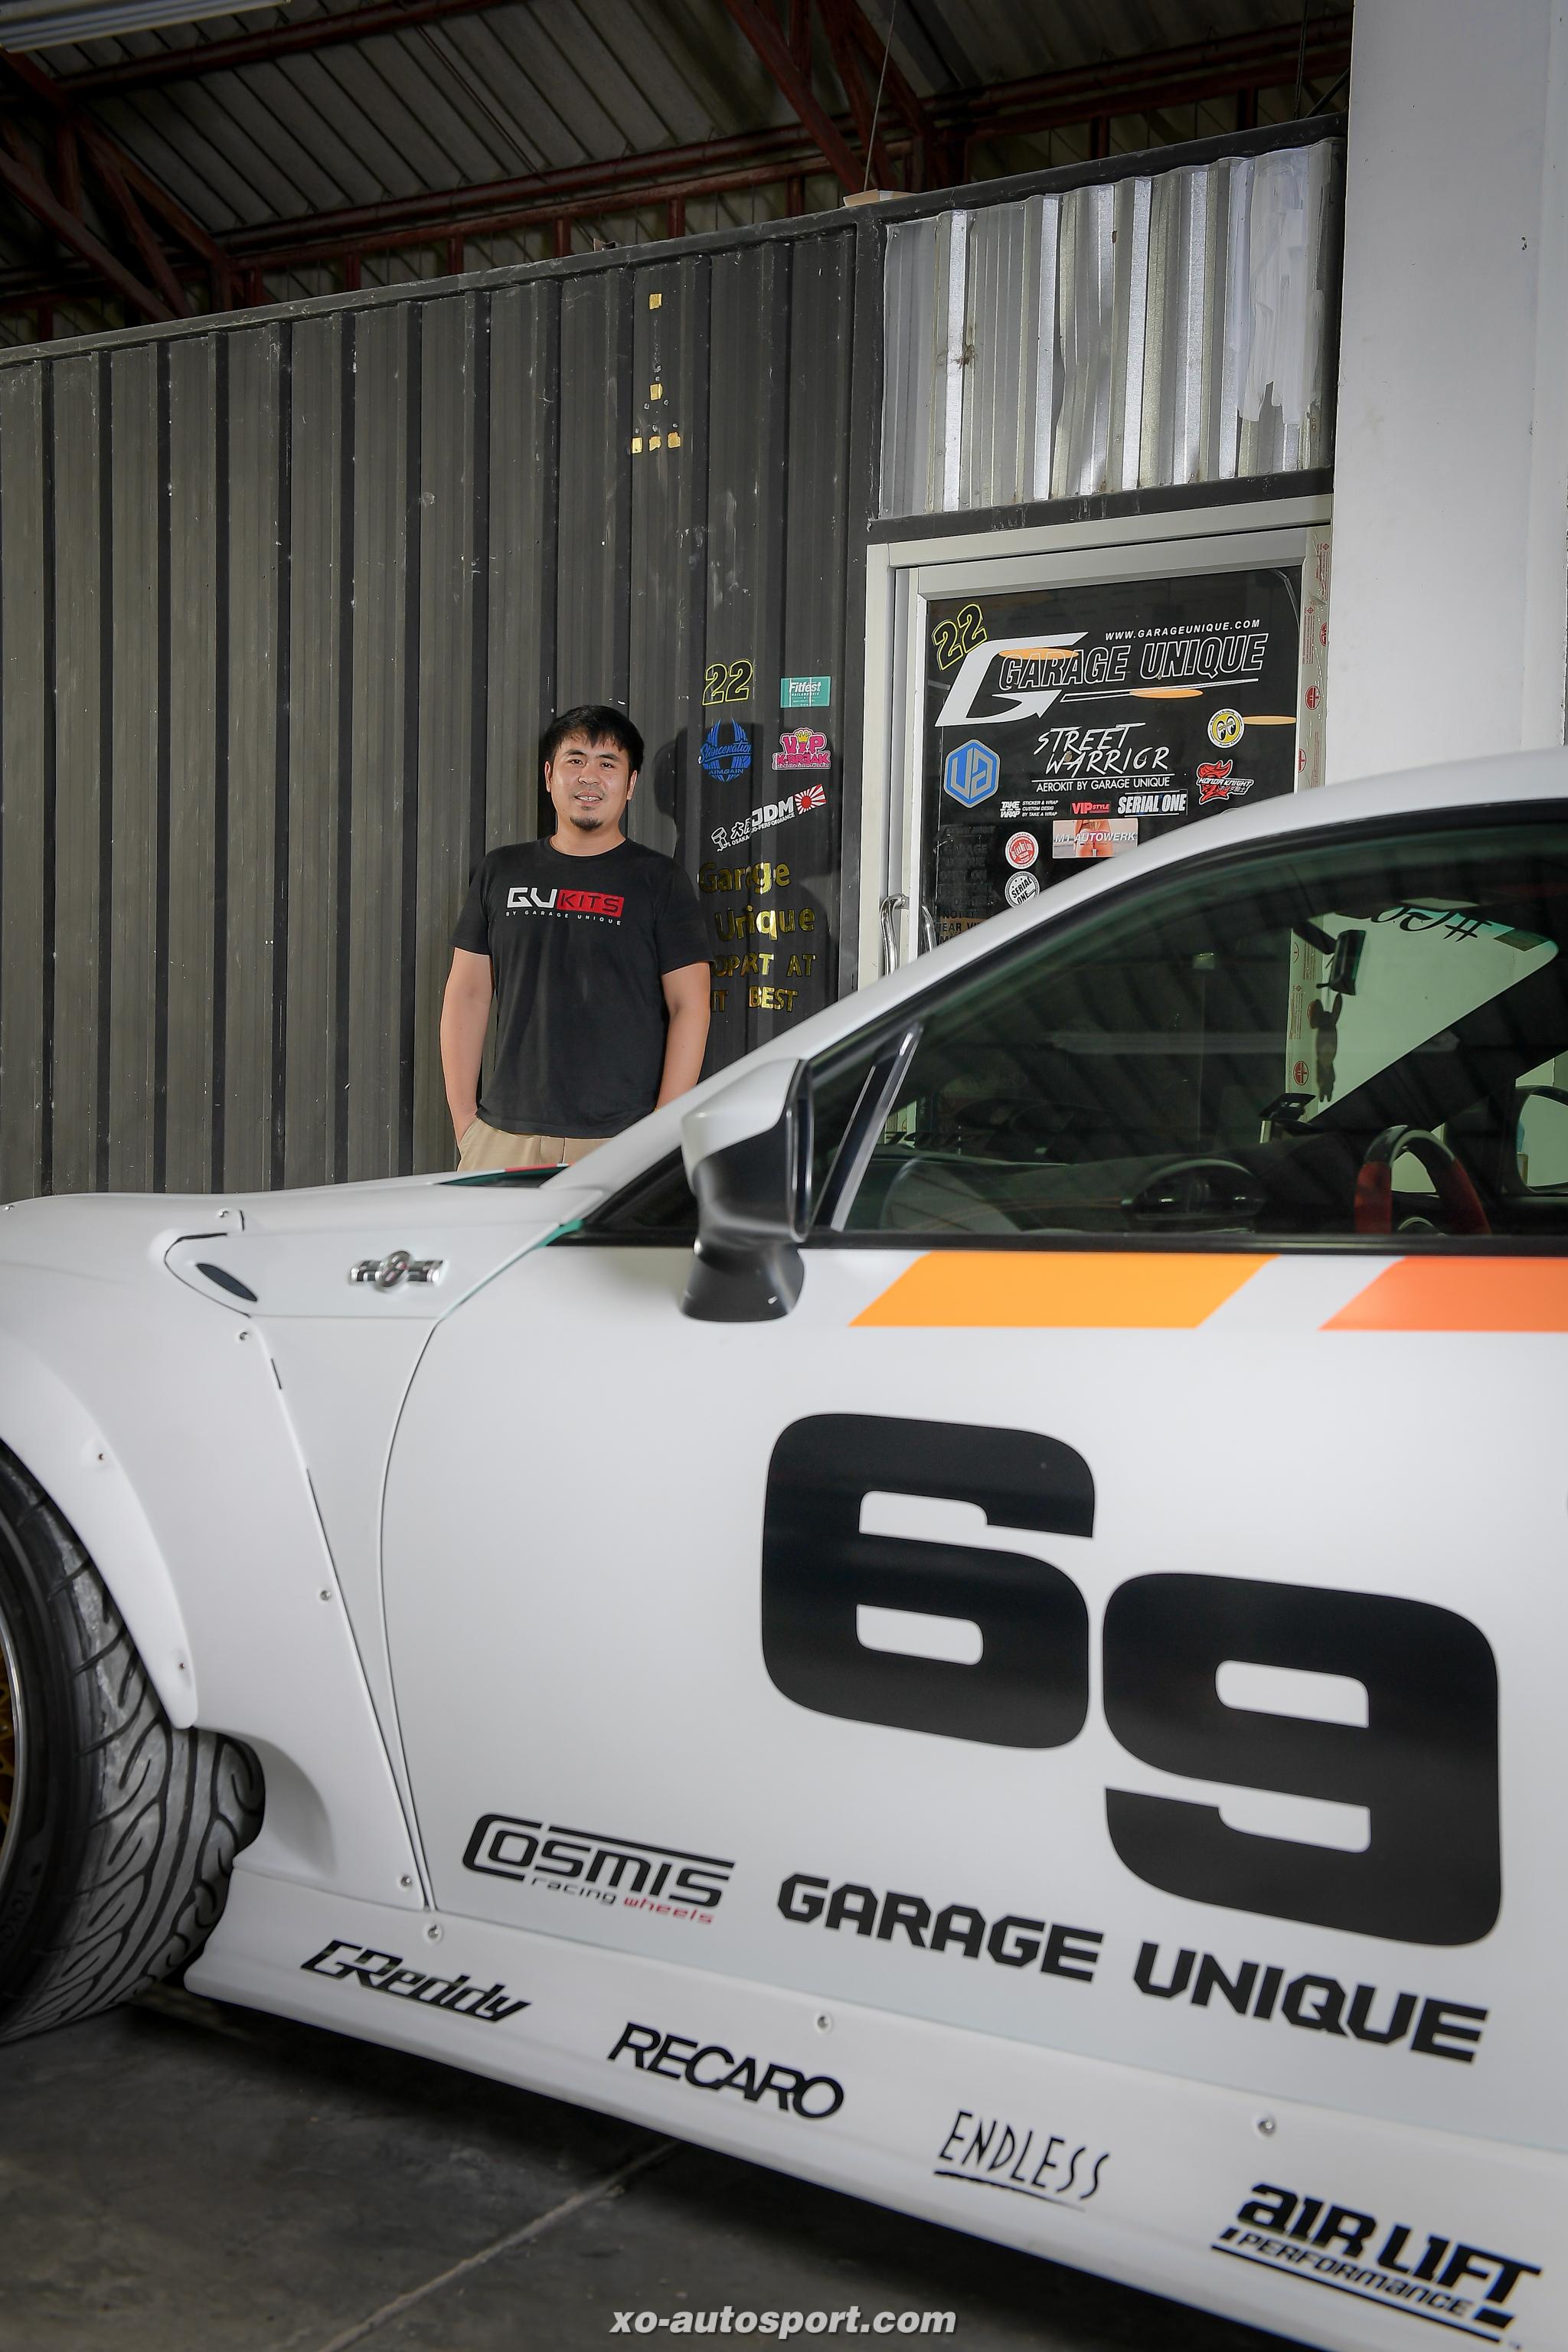 62_04_26 XO สัมภาษณ์ Garage unoque (1)